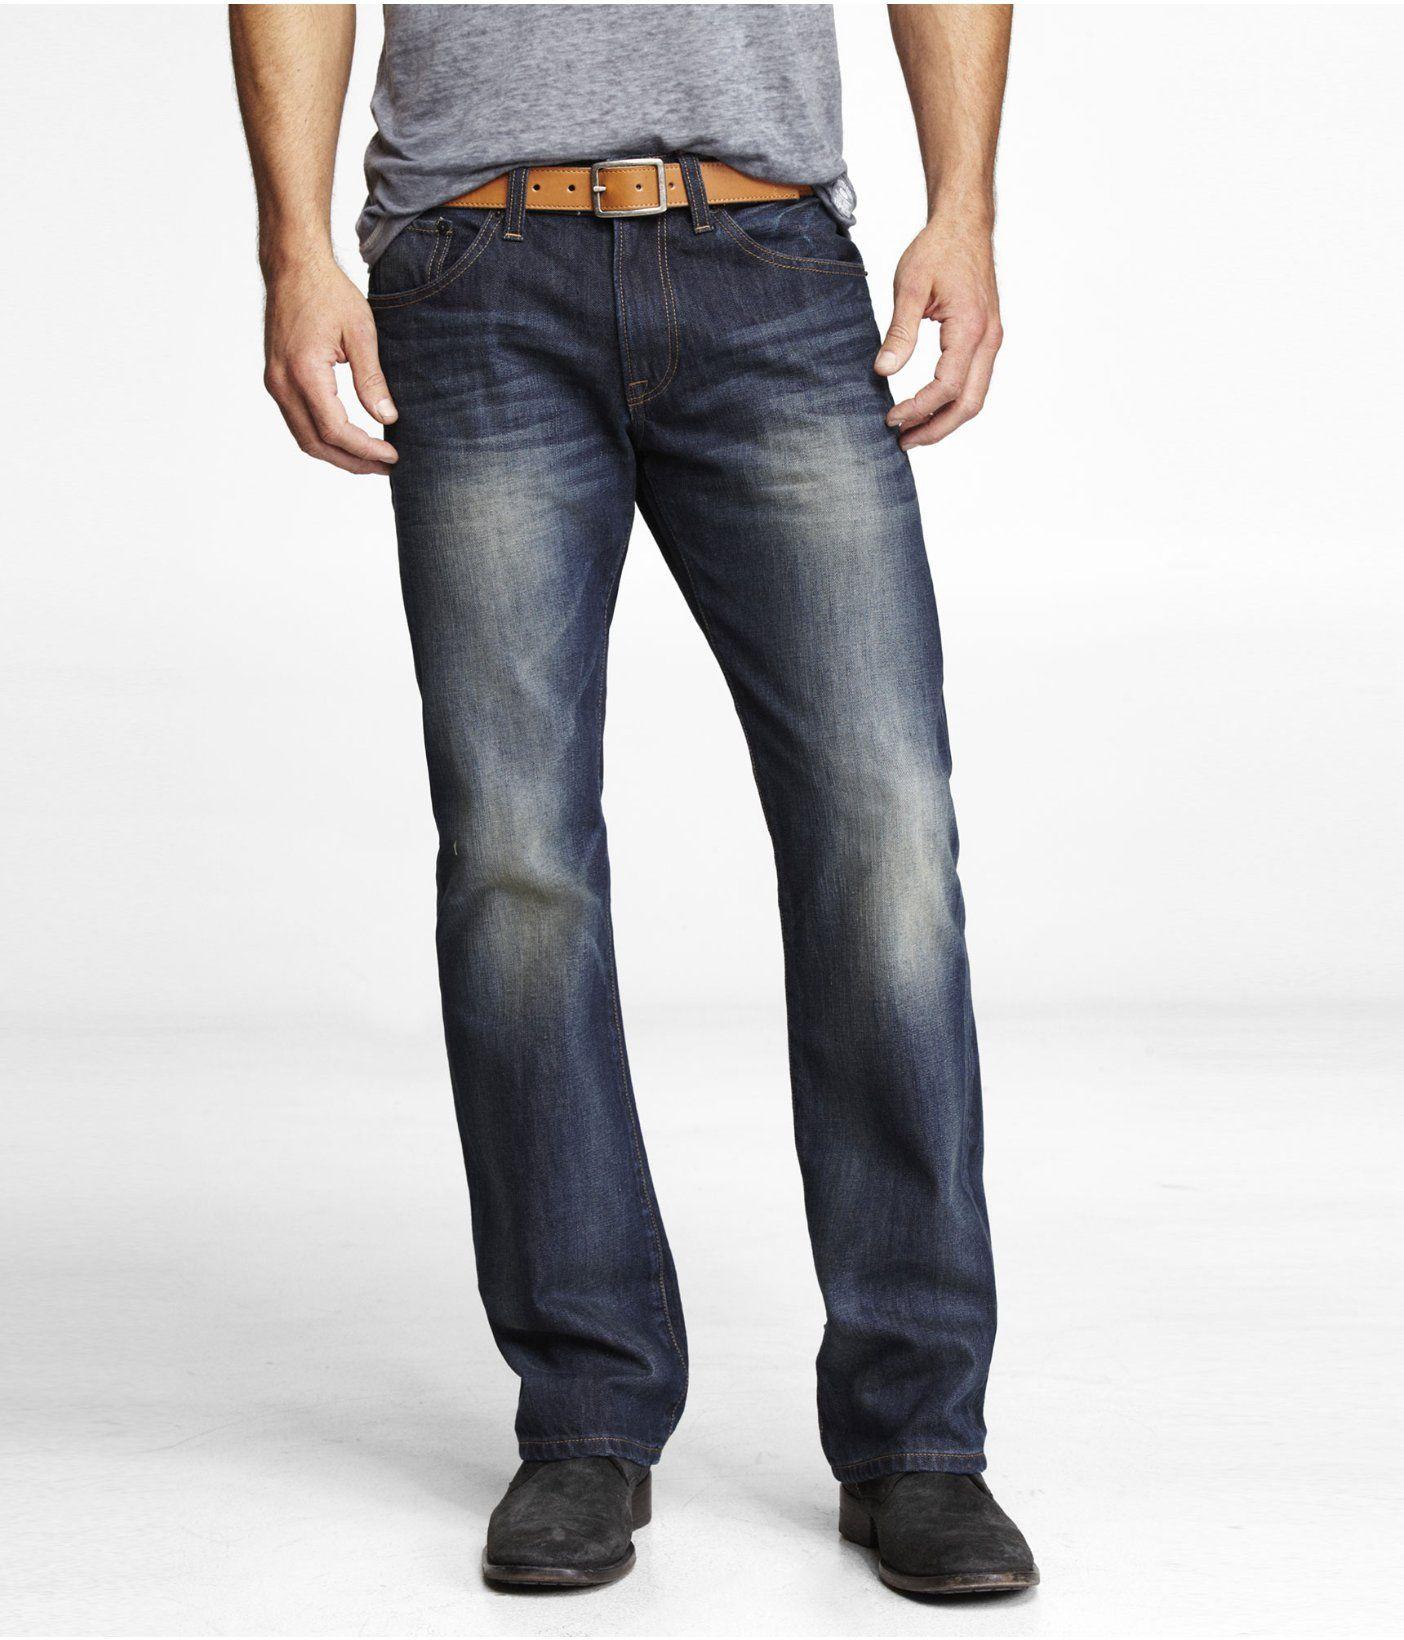 d30b5bd7cc65 ROCCO SLIM FIT BOOT CUT JEAN | Express | Men's Clothing I love (on ...